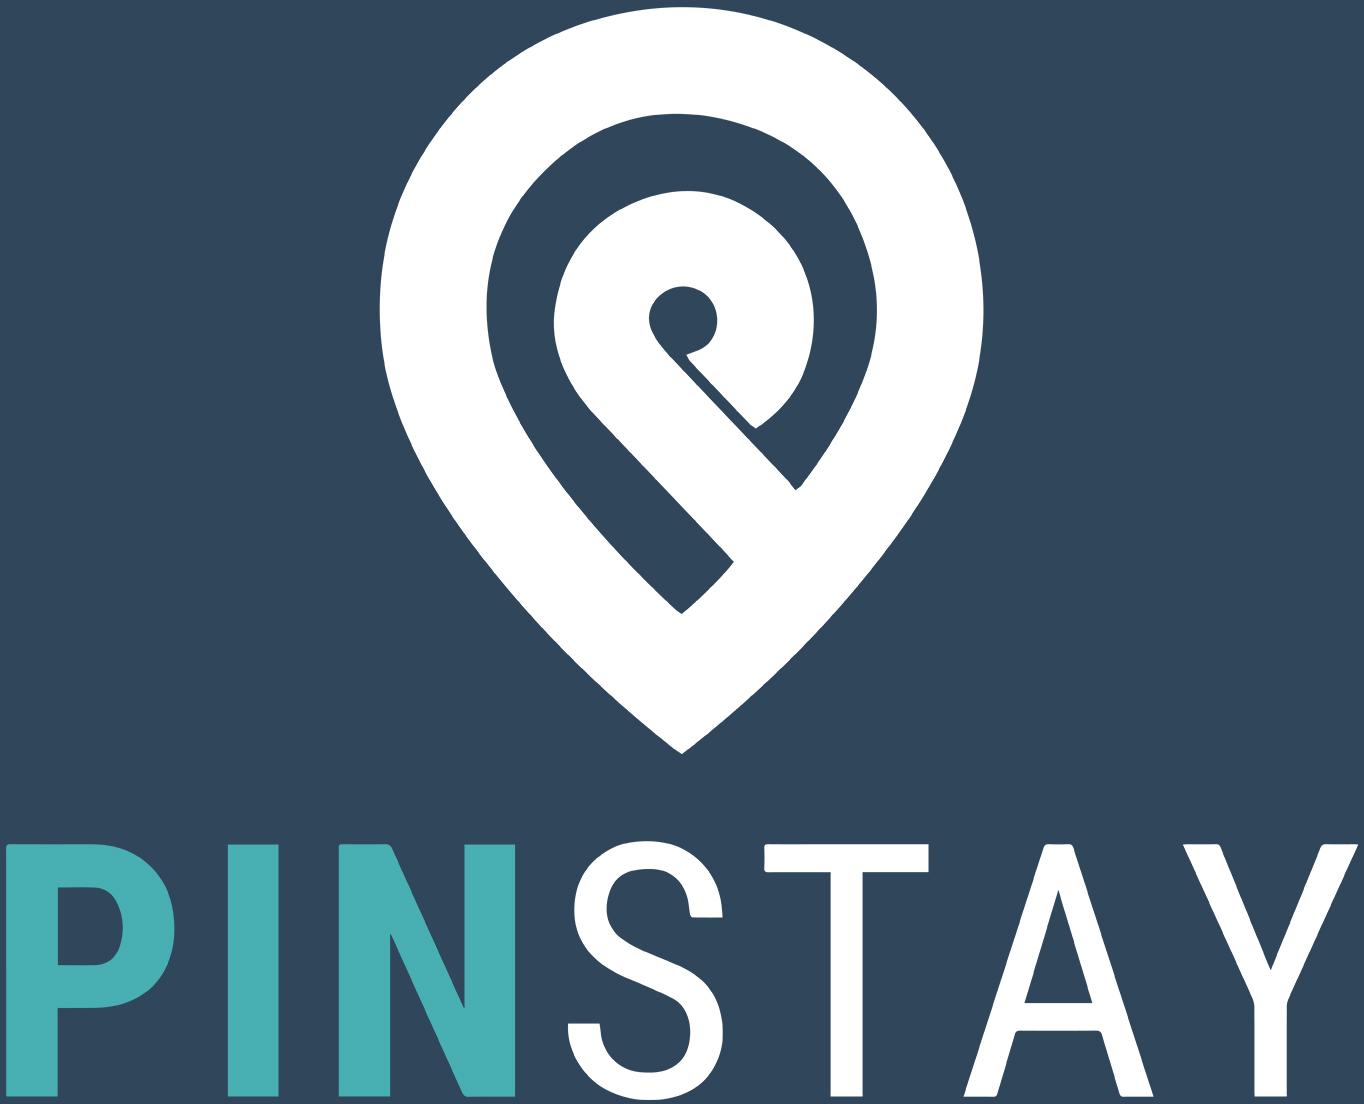 Pinstay